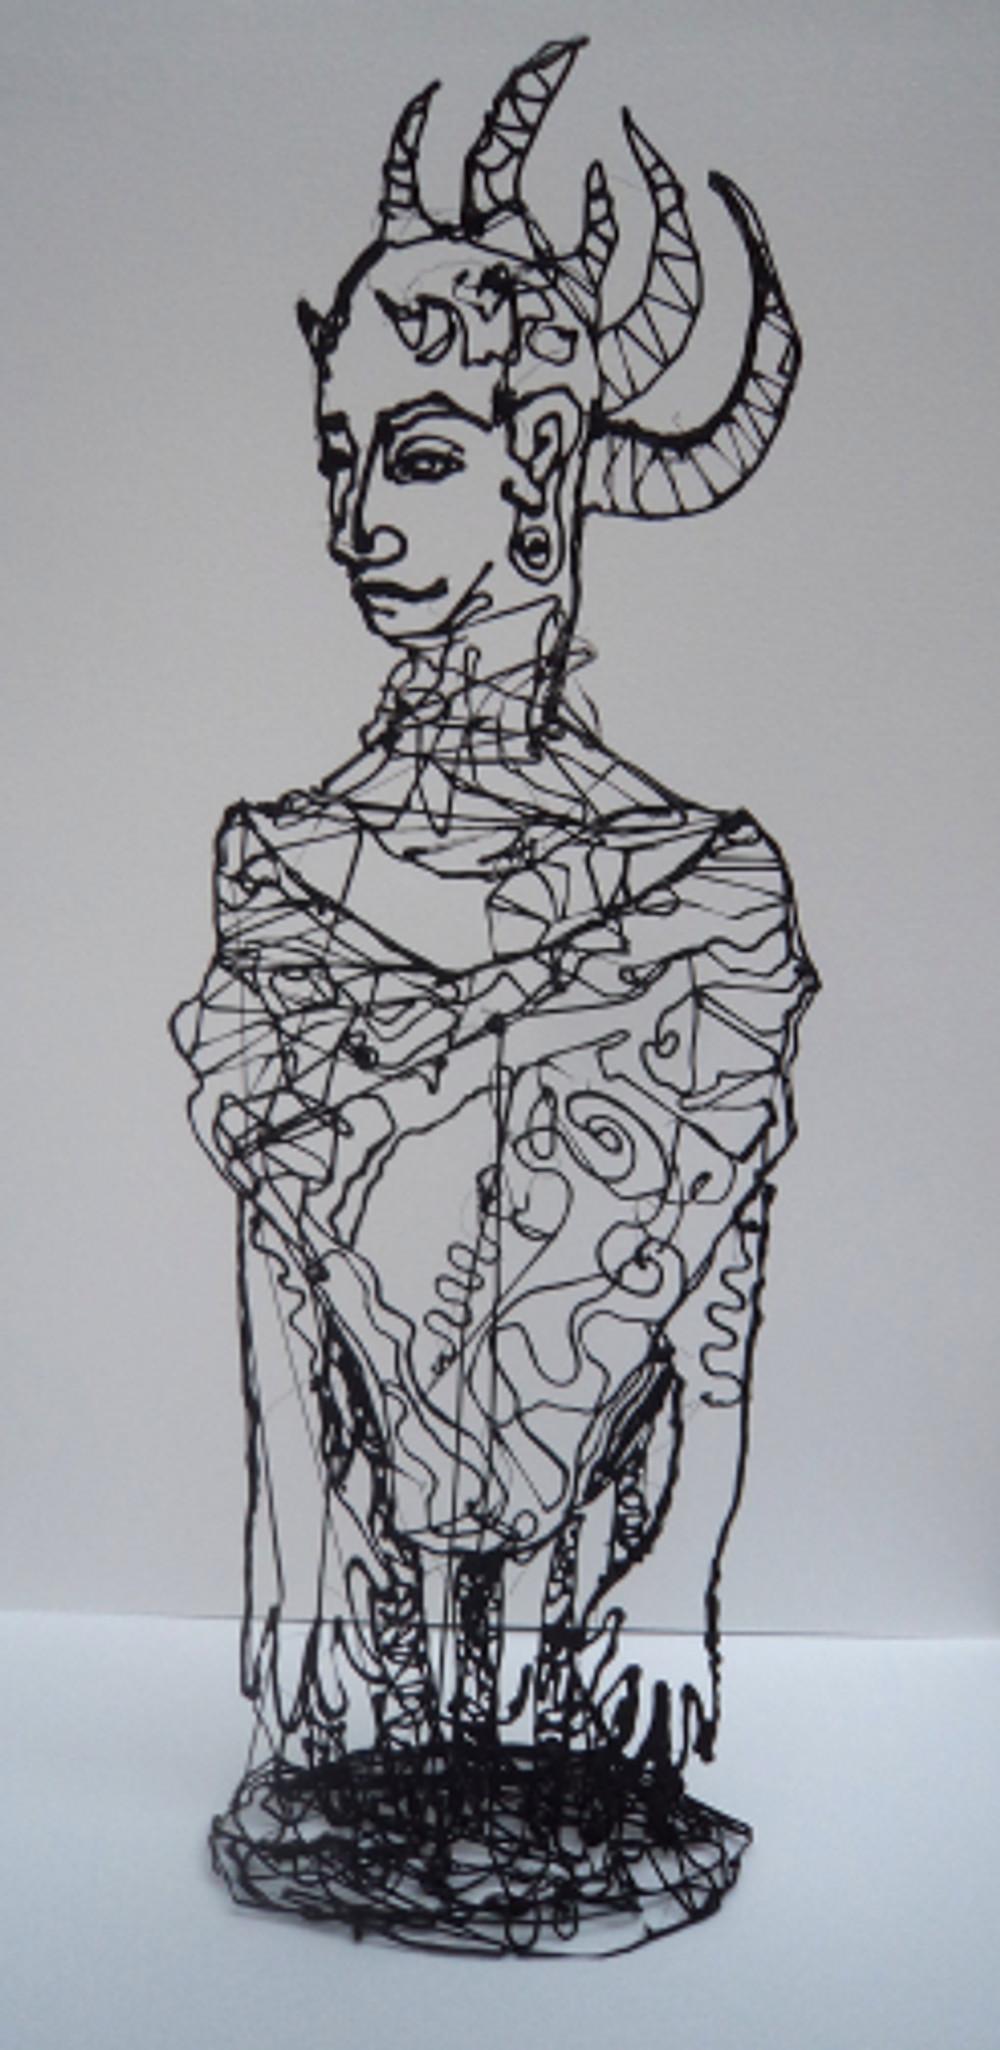 figure no1, 28x12x8 cm pla plastic and color spray, 2018